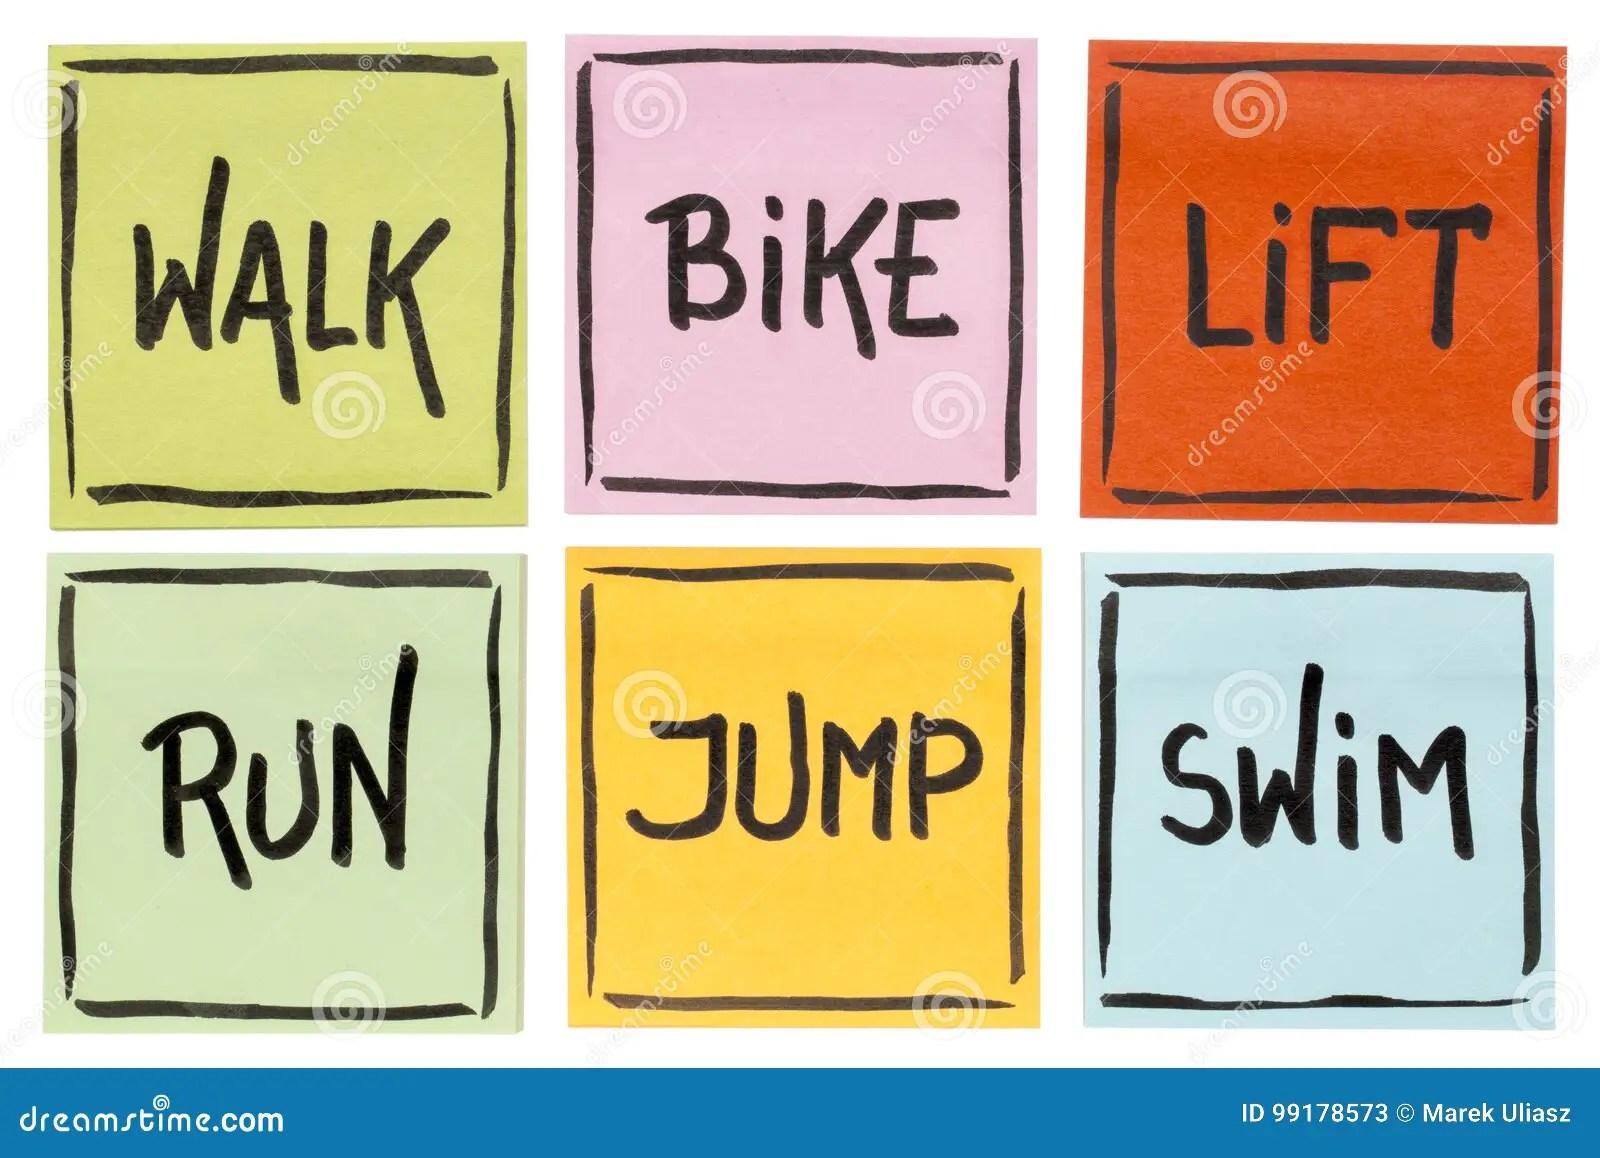 Walk Bike Lift Run Jump Swim